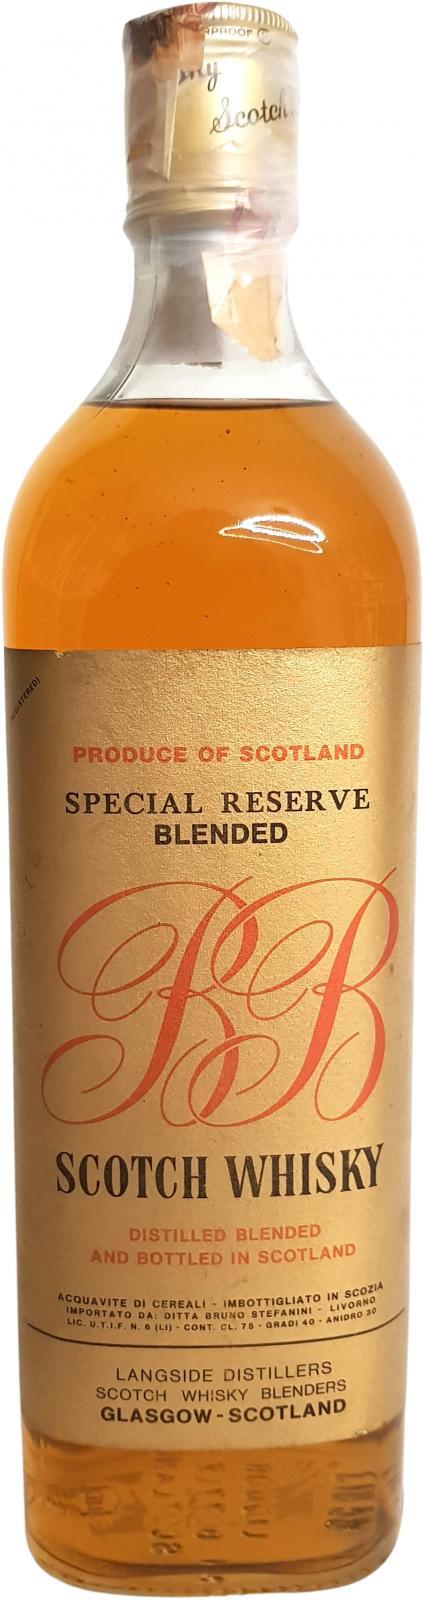 B&B Blended Scotch Whisky